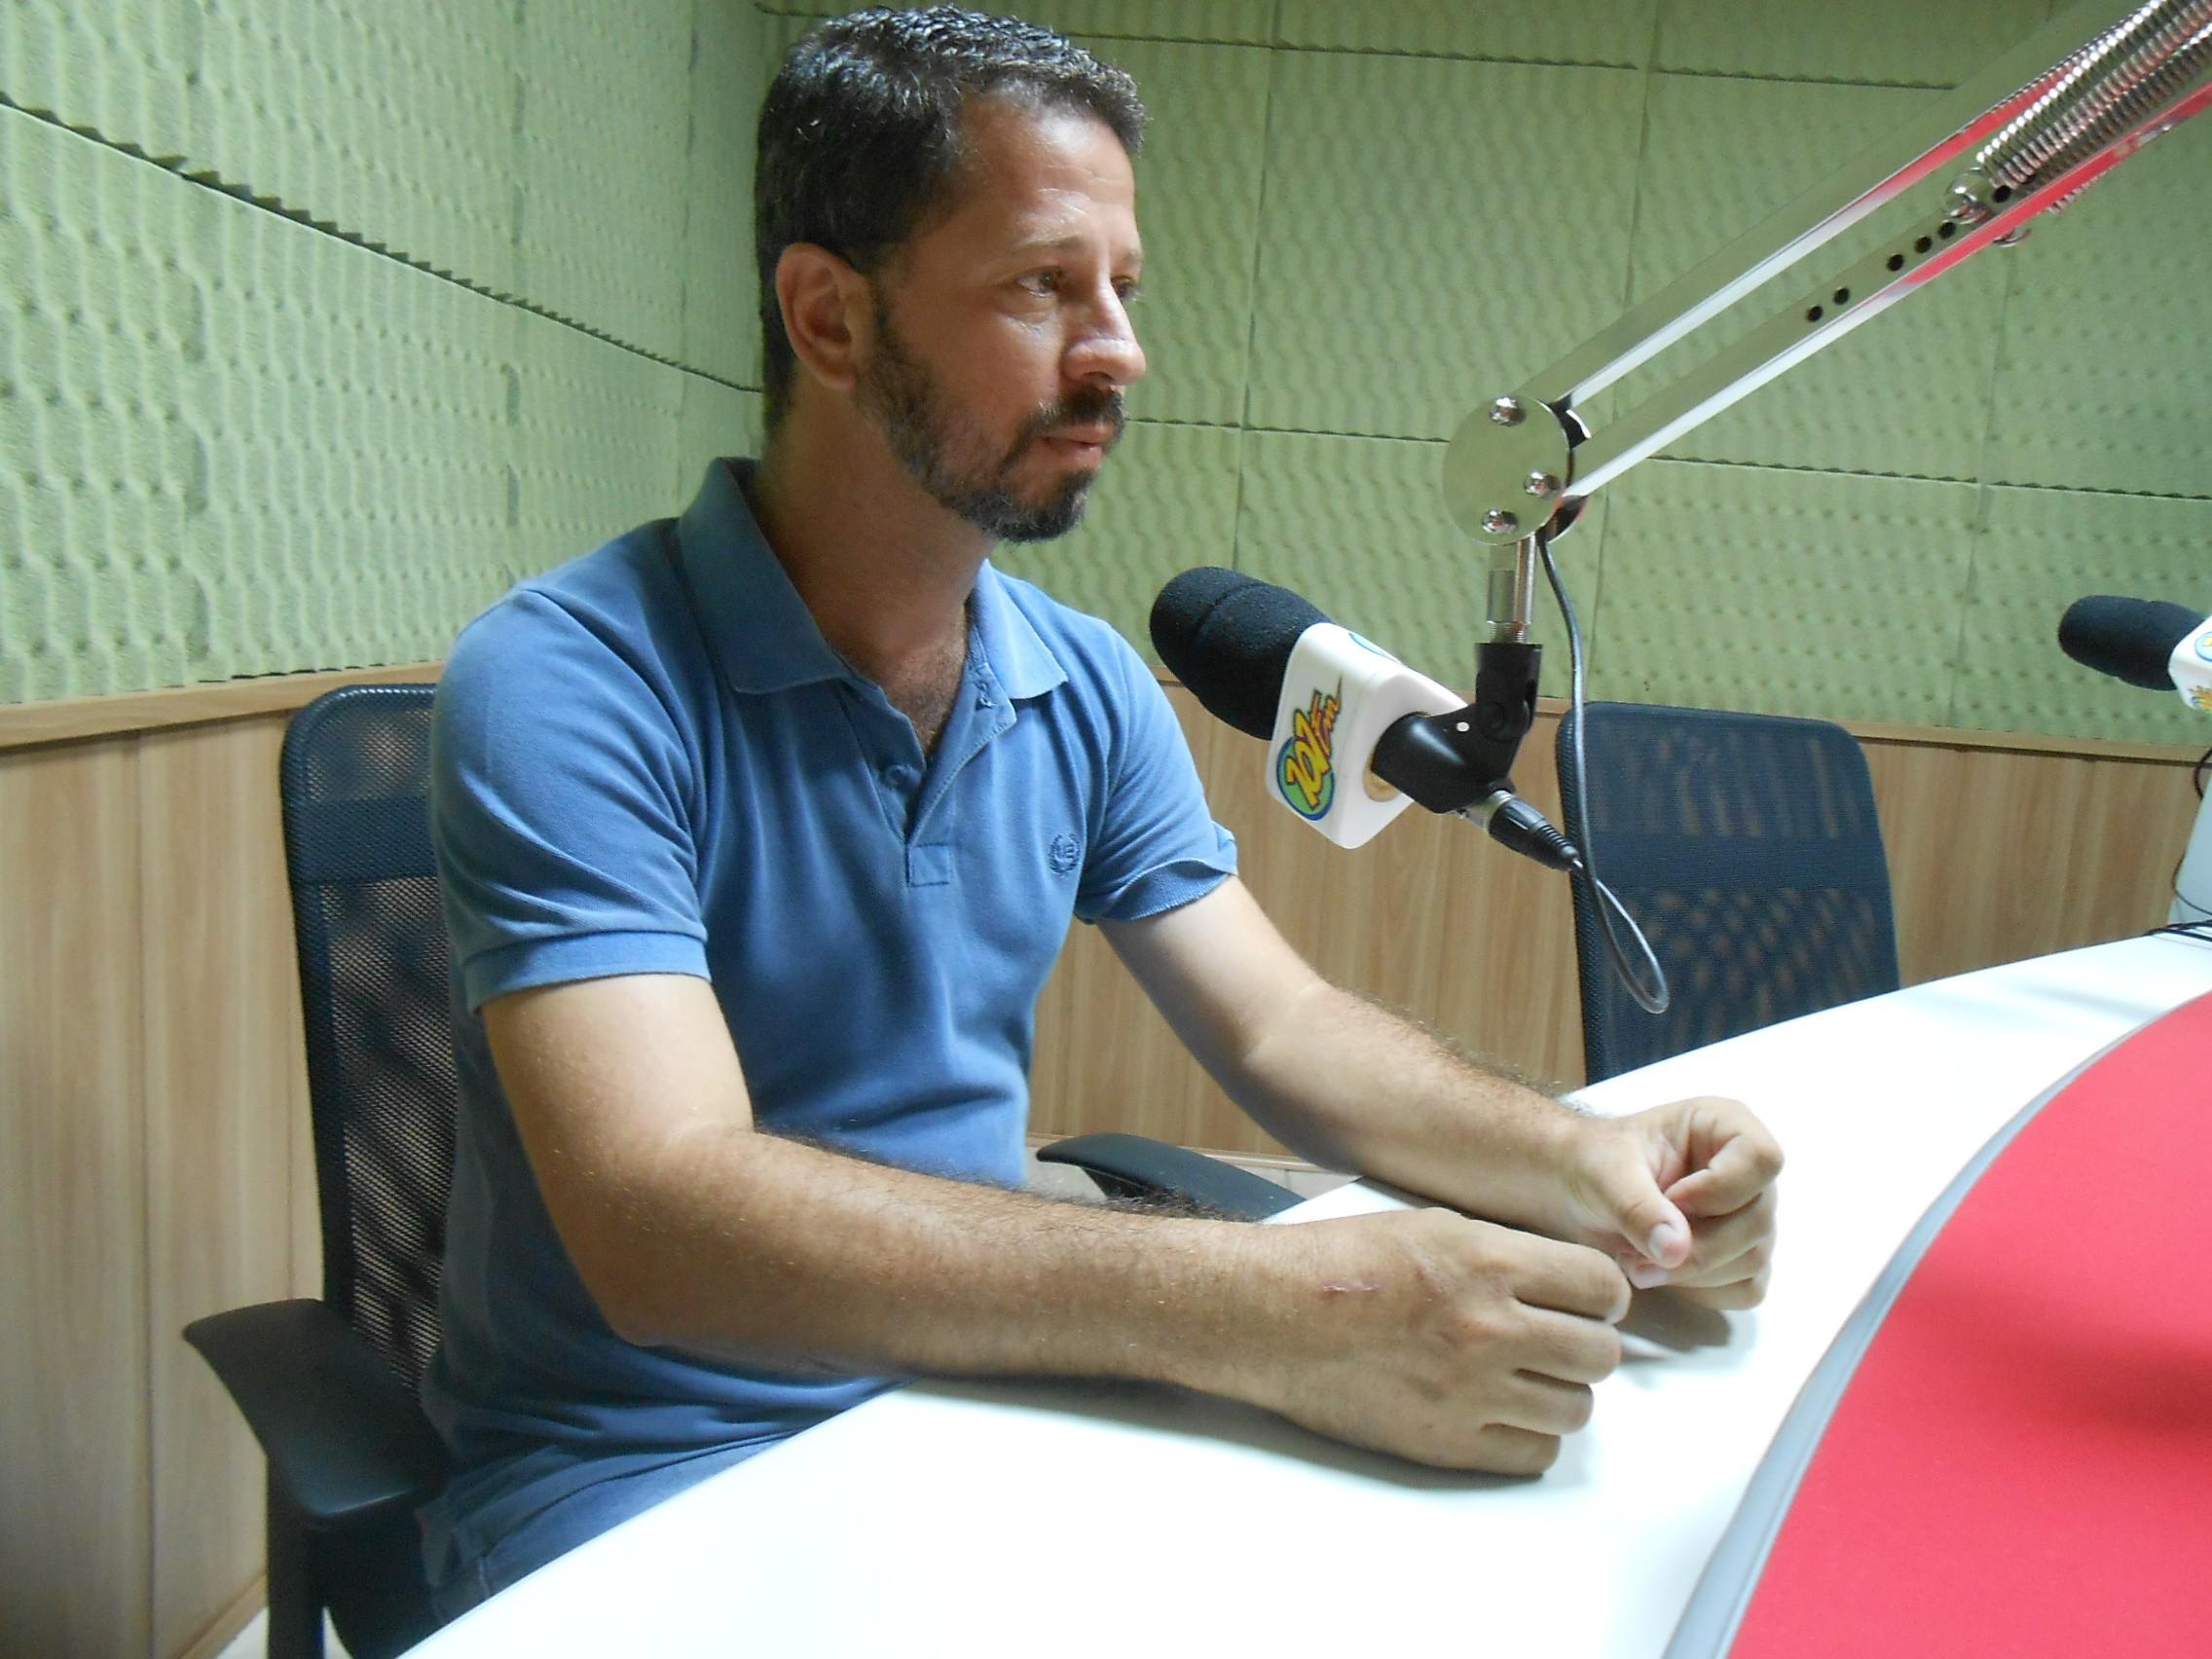 Luciano Scarpim, presidente da ONG Fenix (Foto: Fábio Penariol/Jornal 101)